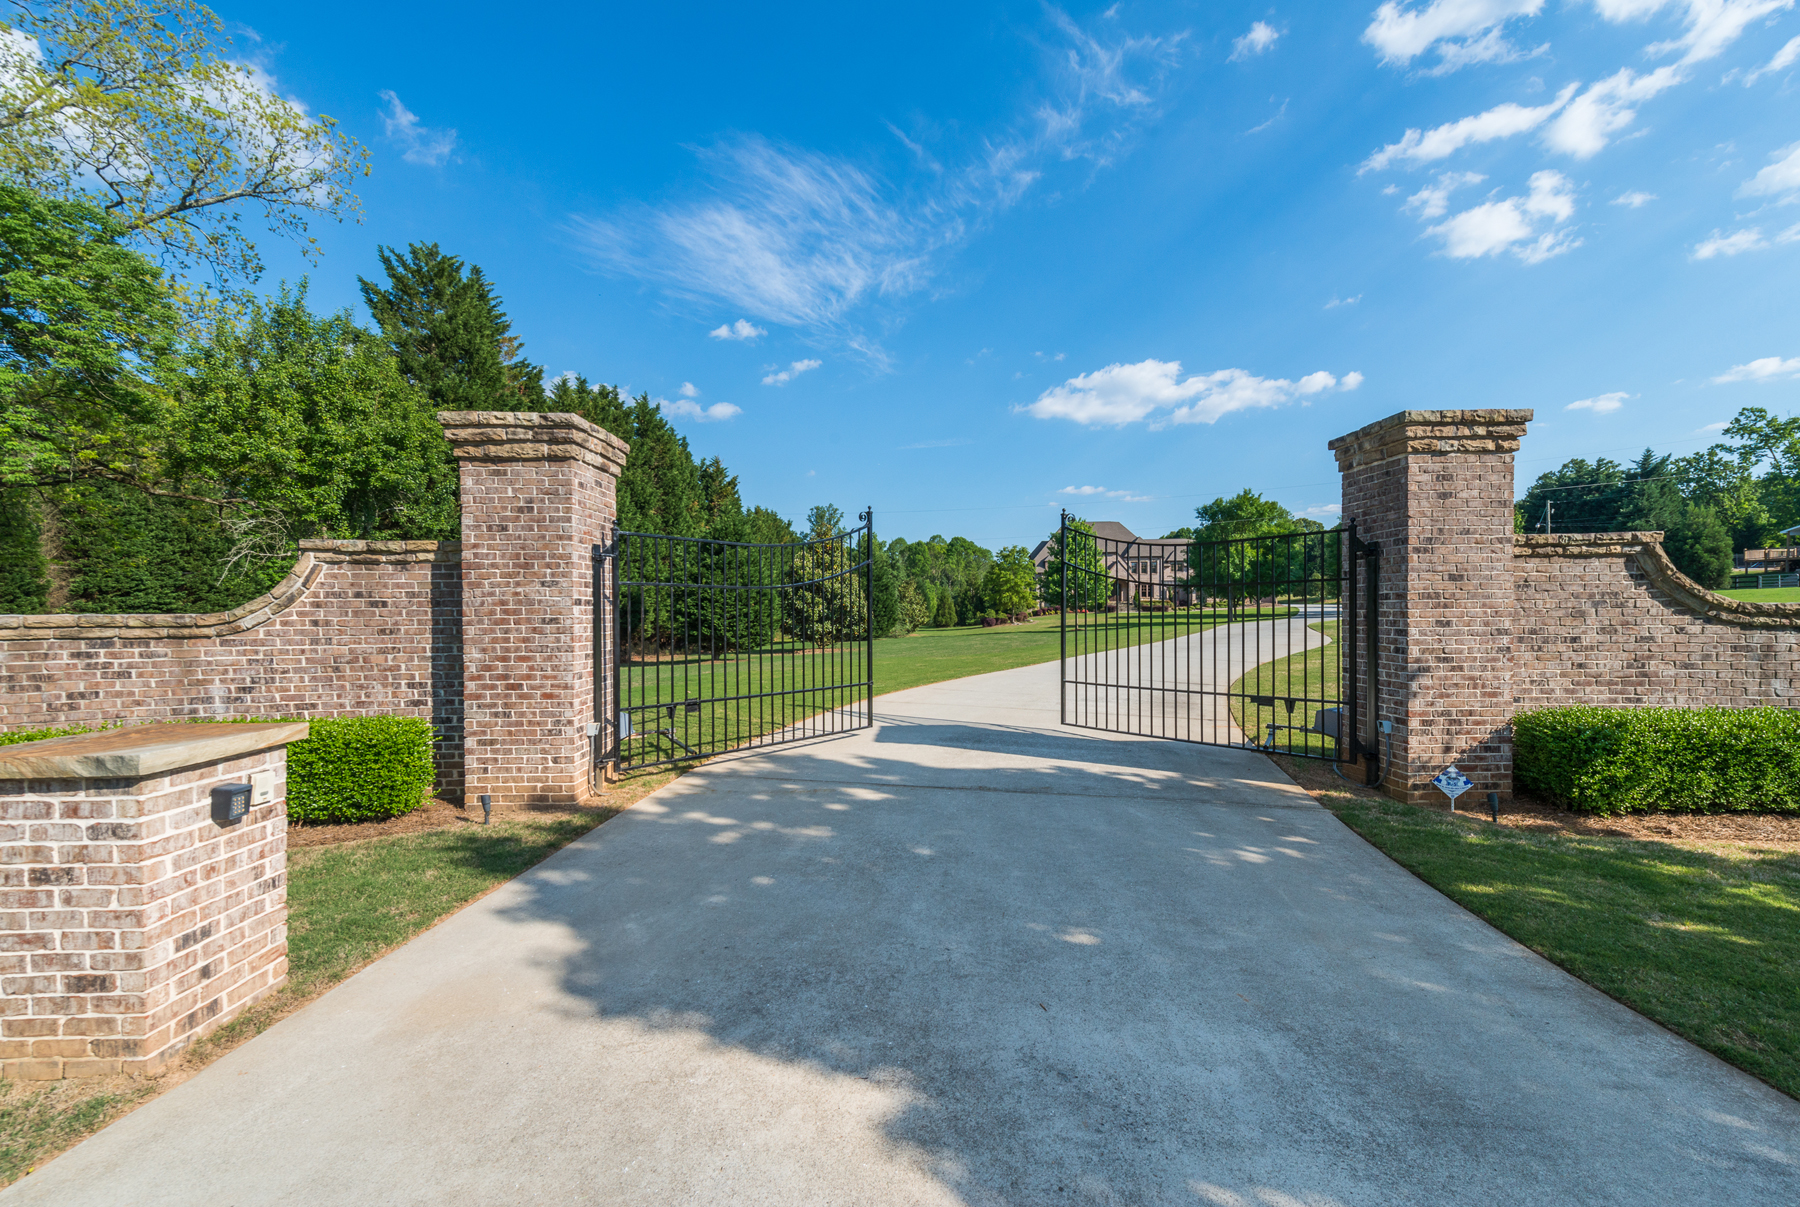 獨棟家庭住宅 為 出售 在 Suwanee Farm 5233 Moore Road Suwanee, 喬治亞州 30024 美國